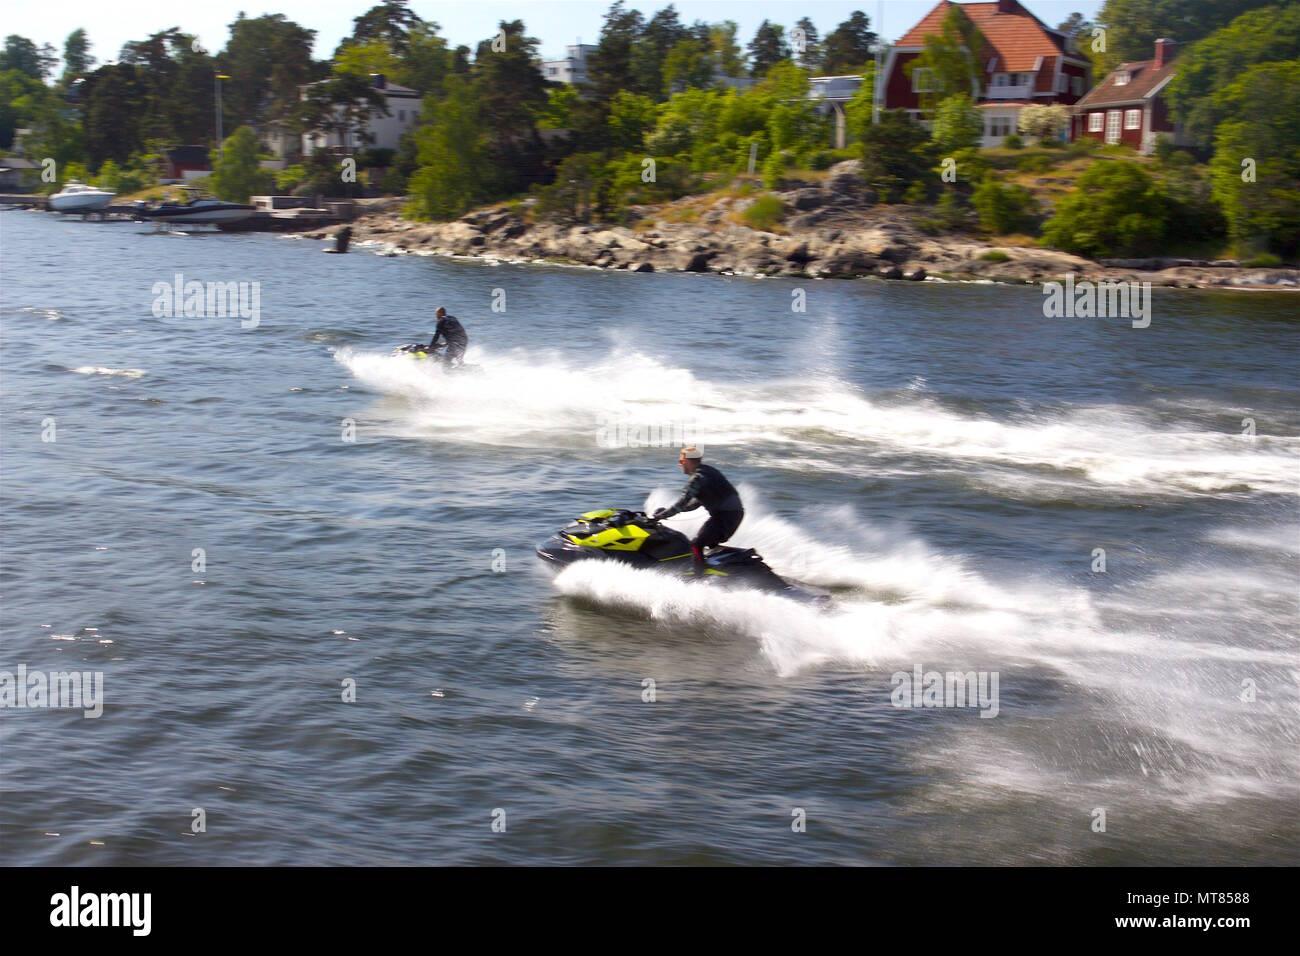 Jetskis in Stockholm Archipelago - Stock Image